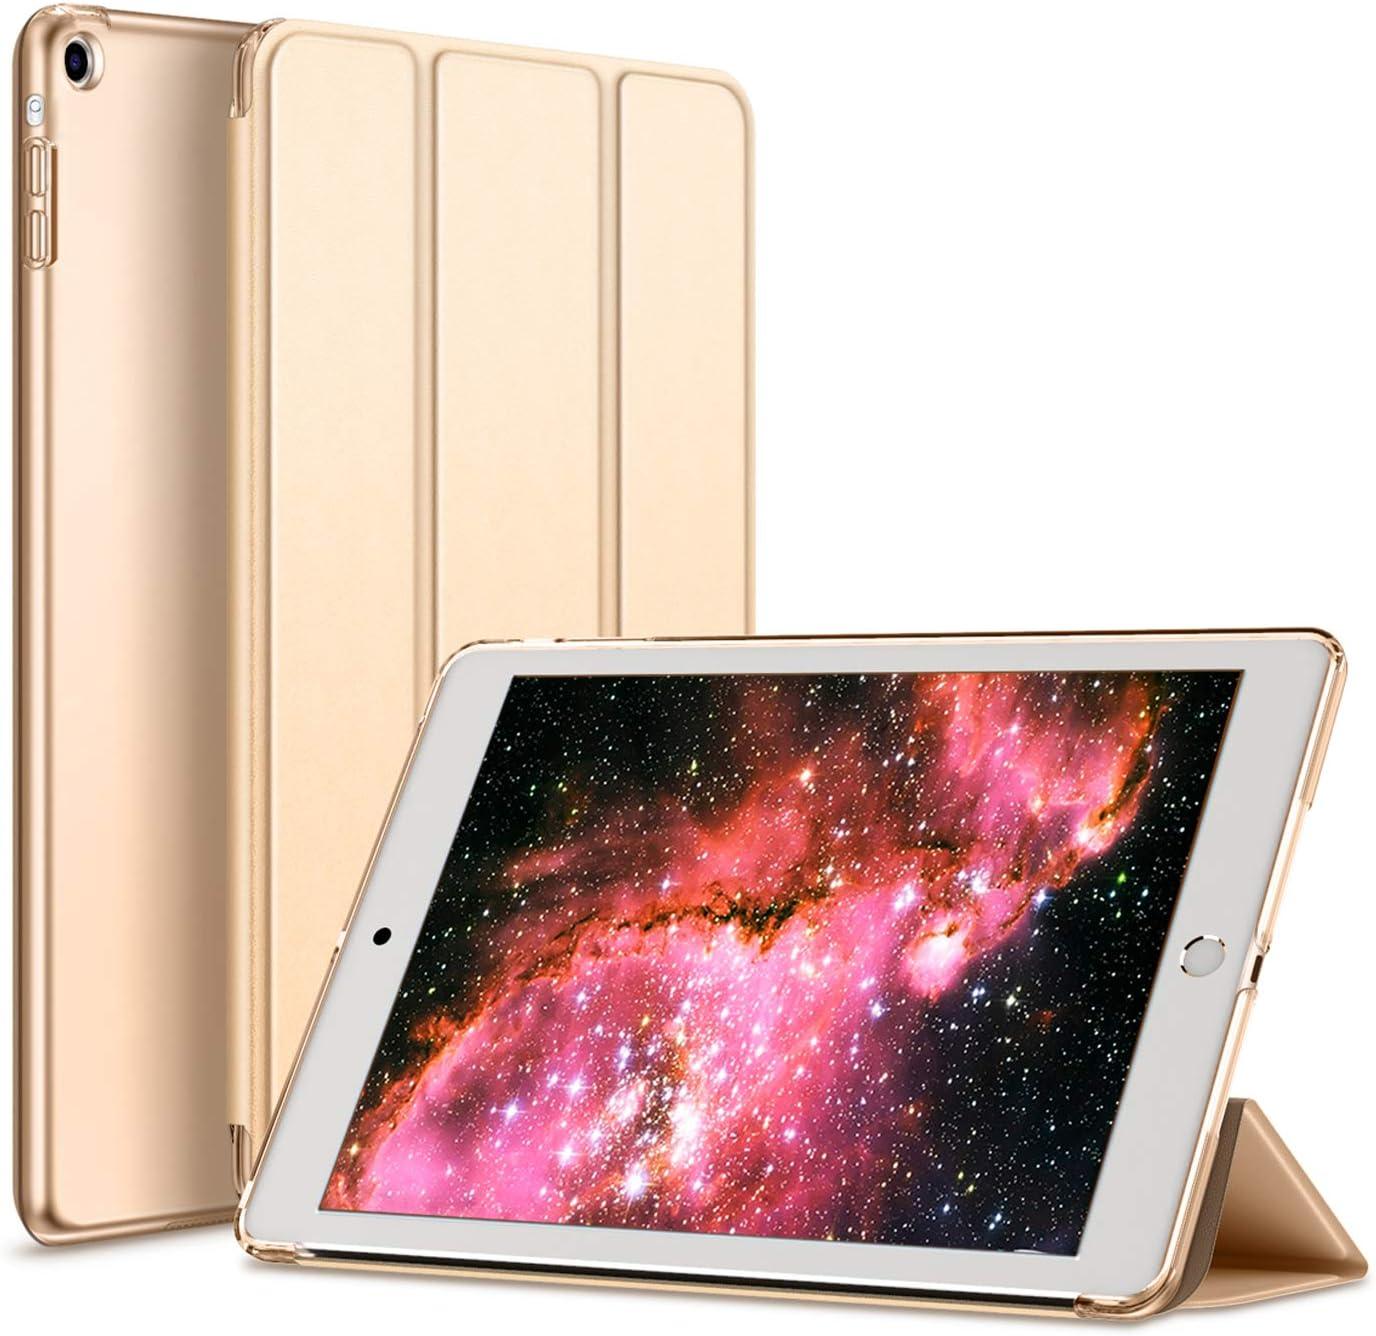 Kenke iPad Case Mini 1/2/3 Generation Slim Lightweight Smart iPad Cover 7.9 Inch,Transparent Hard Shell with Auto Sleep Wake for iPad Mini 1, Mini 2, Mini 3 (Gold)